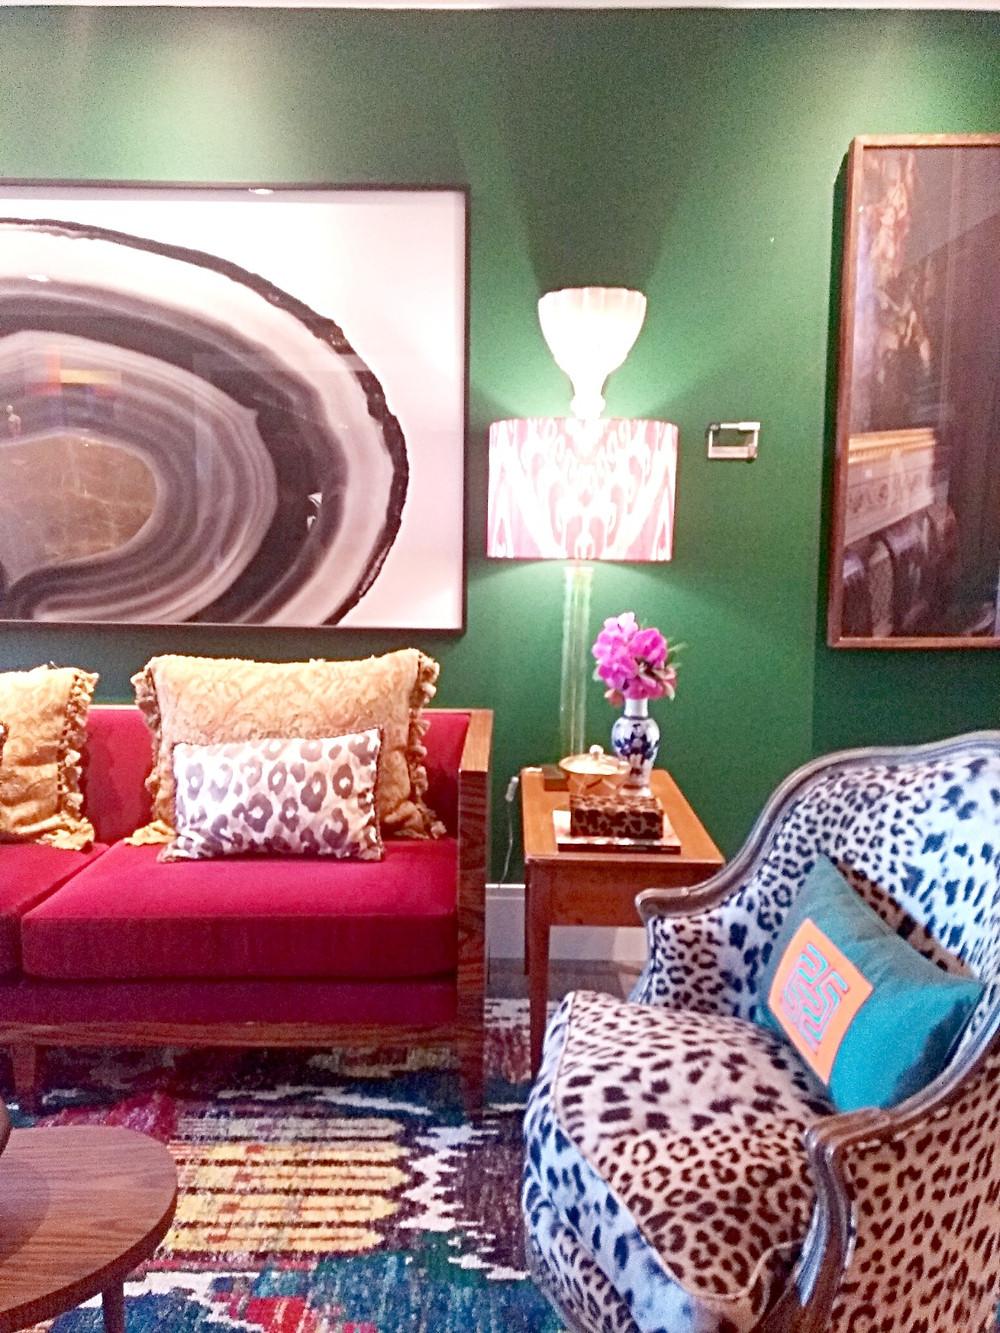 Sala de estar retrô com mix de estampas.